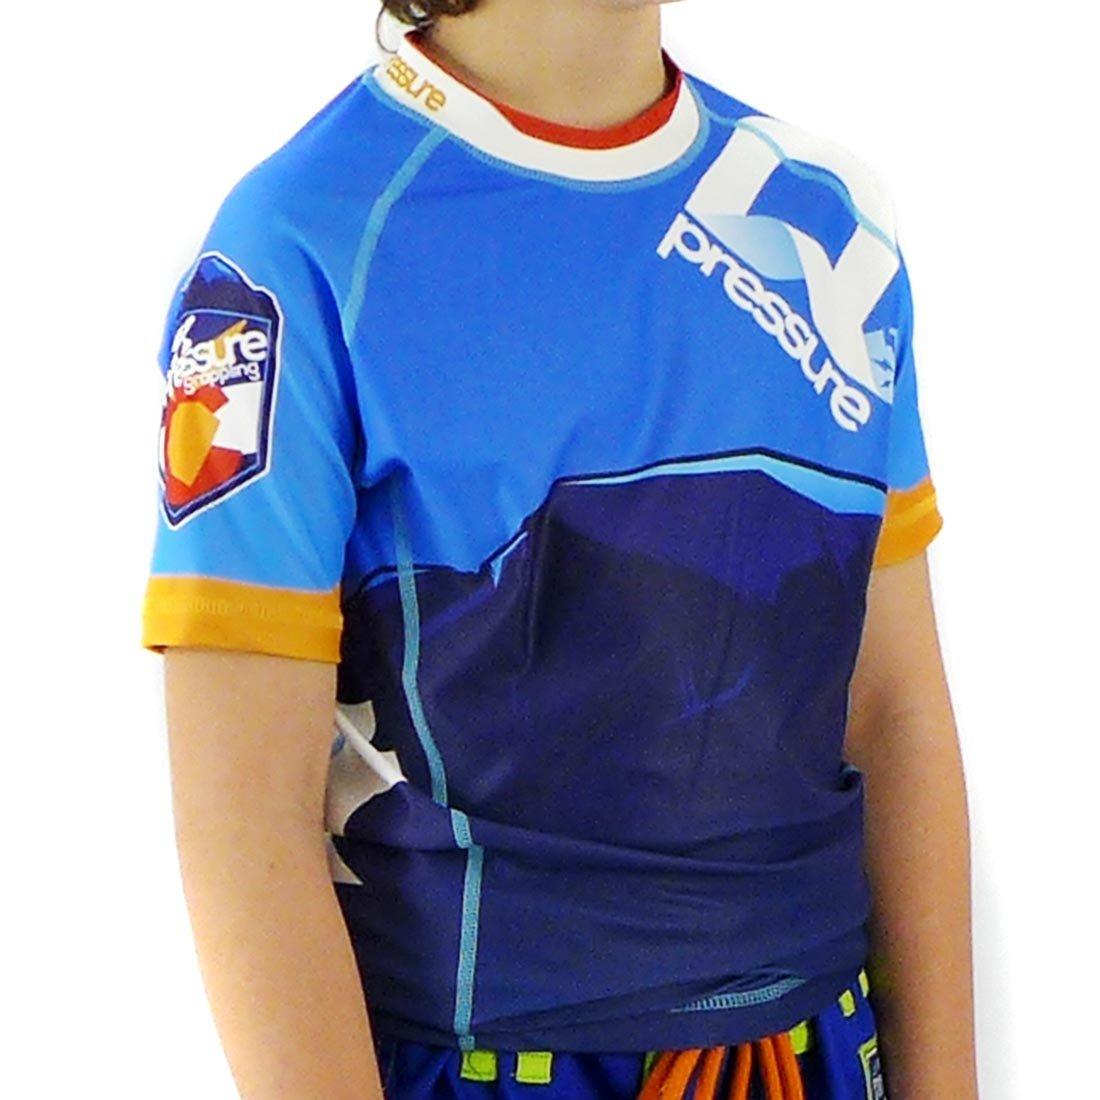 Pressure Grappling Kid's Premium BJJ Short Sleeve Rash Guards with Lockdown Band (Altitude, 2X Large) (Altitude, Youth Large) by Pressure Grappling